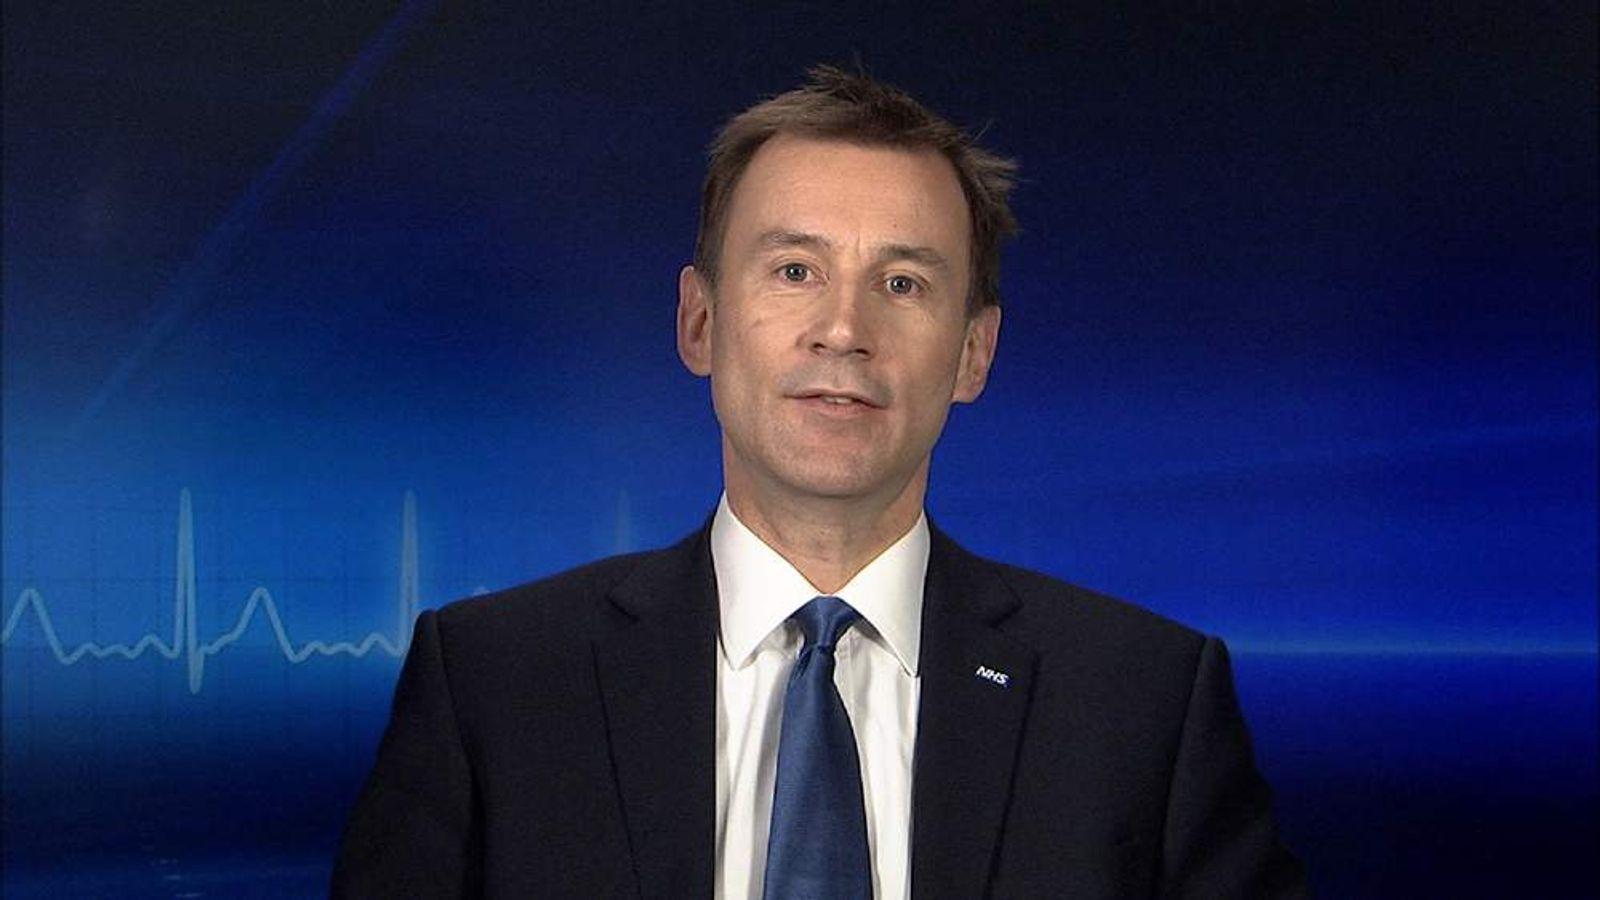 Jeremy Hunt MP, Health Secretary